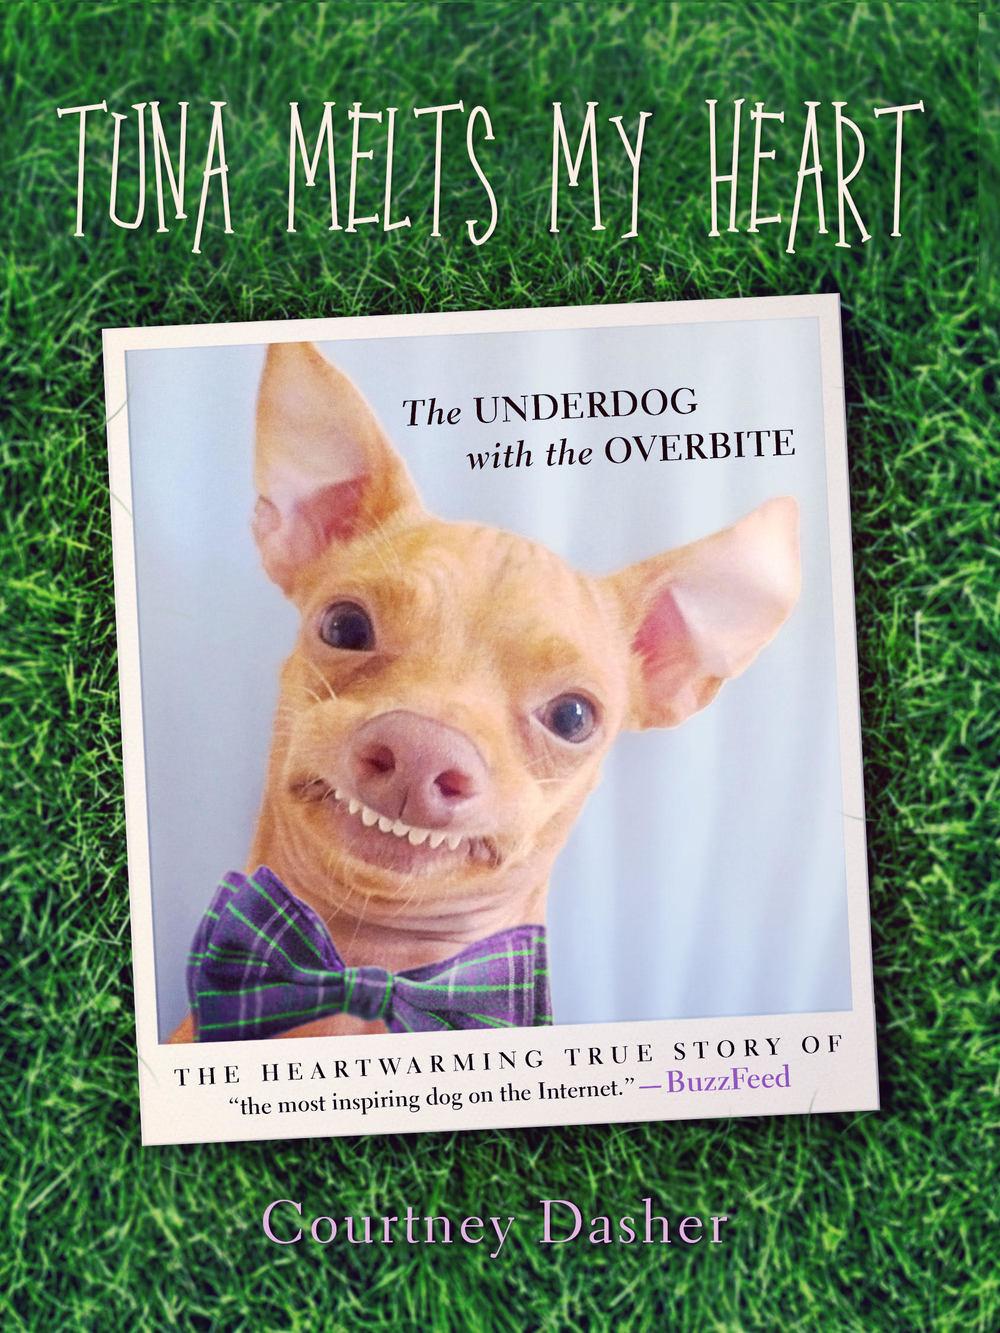 THE TUNA BOOK - BACK IN STOCK